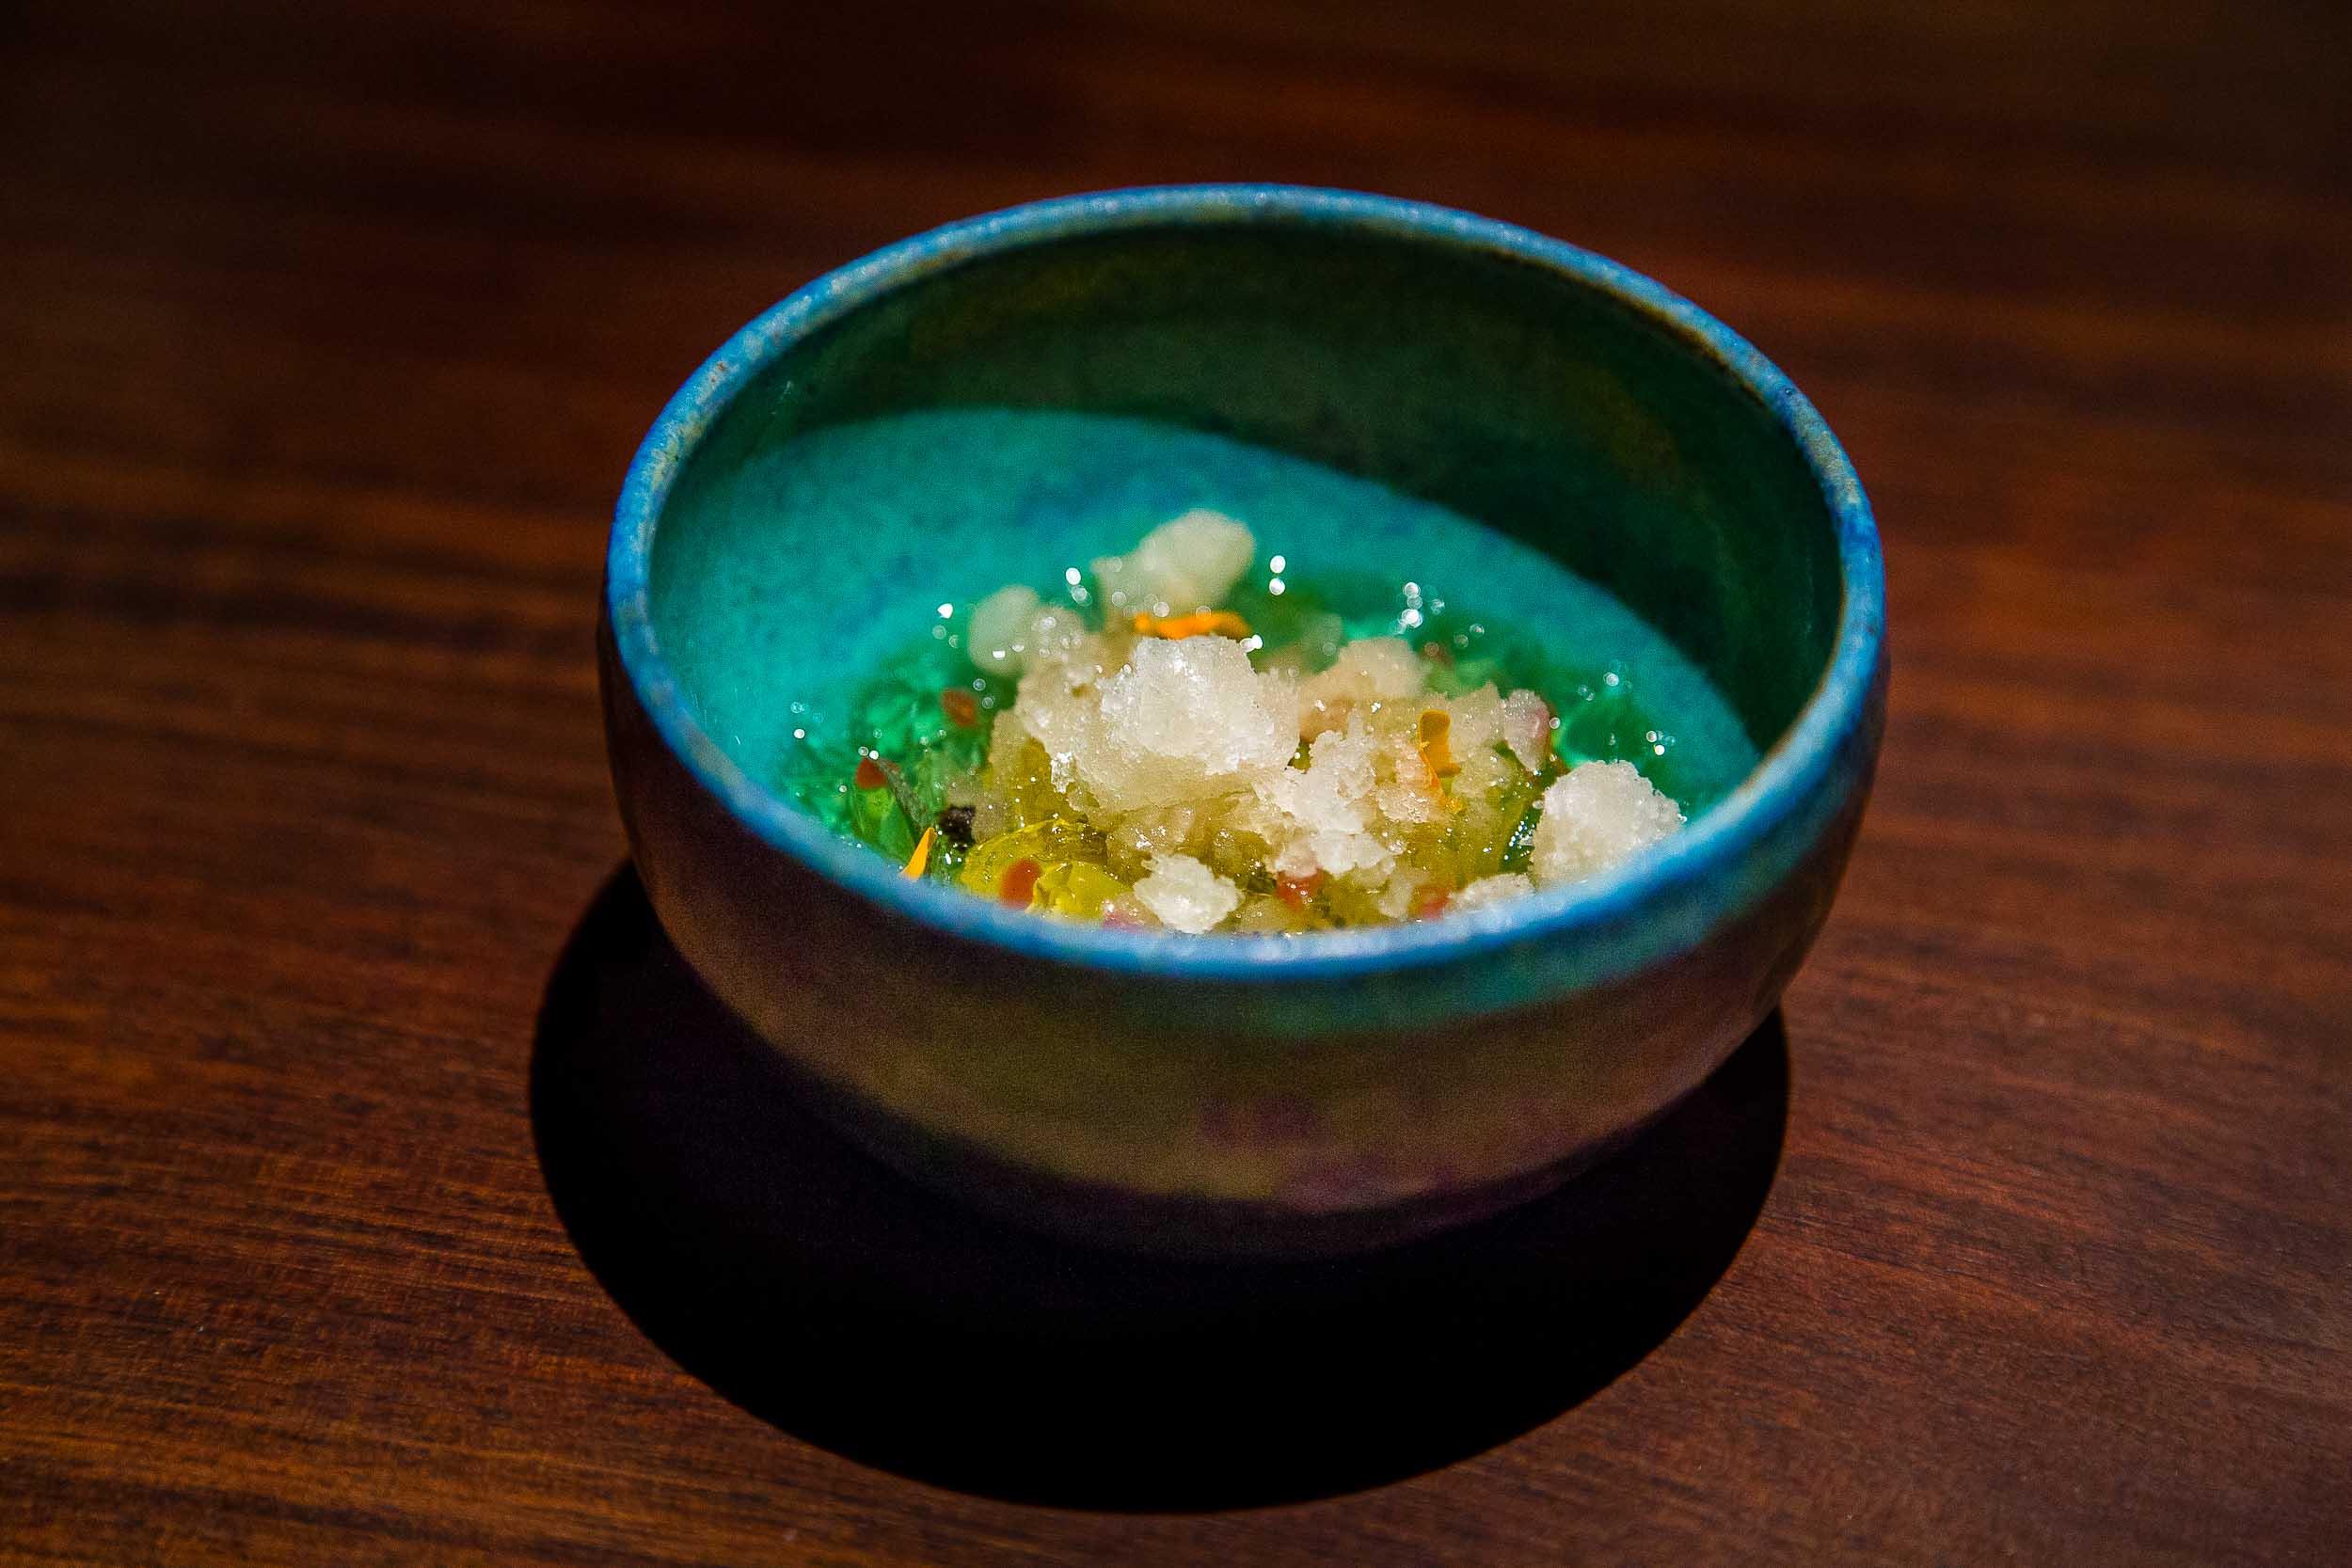 Pickles over horseradish ice, reminiscent of tsukemono.